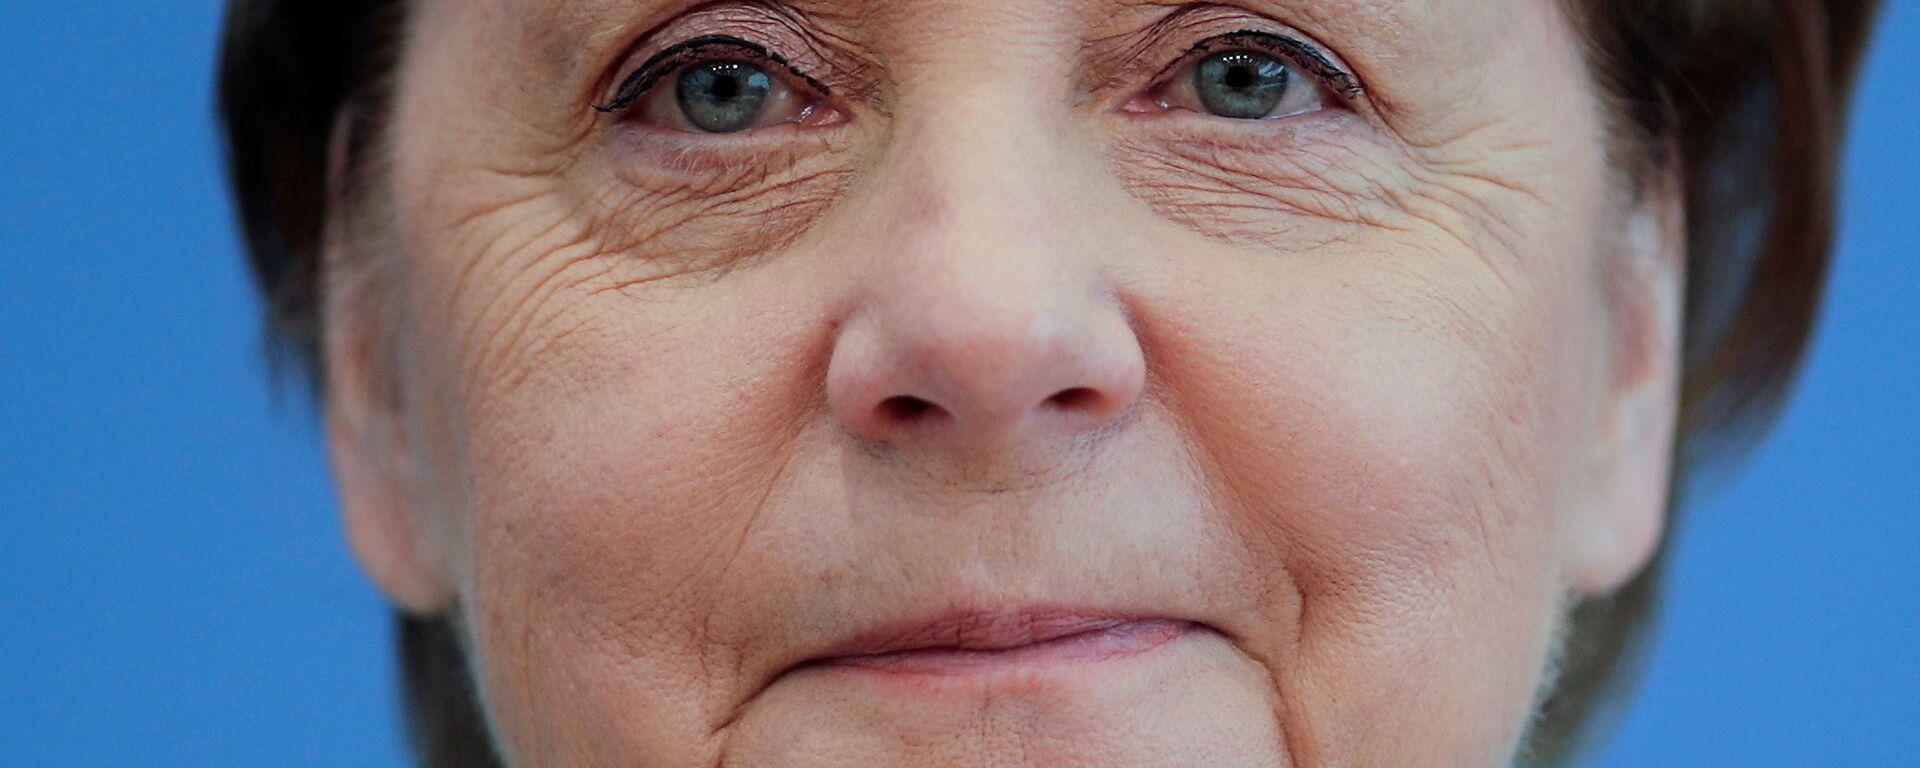 Angela Merkel - Sputnik Türkiye, 1920, 22.09.2021